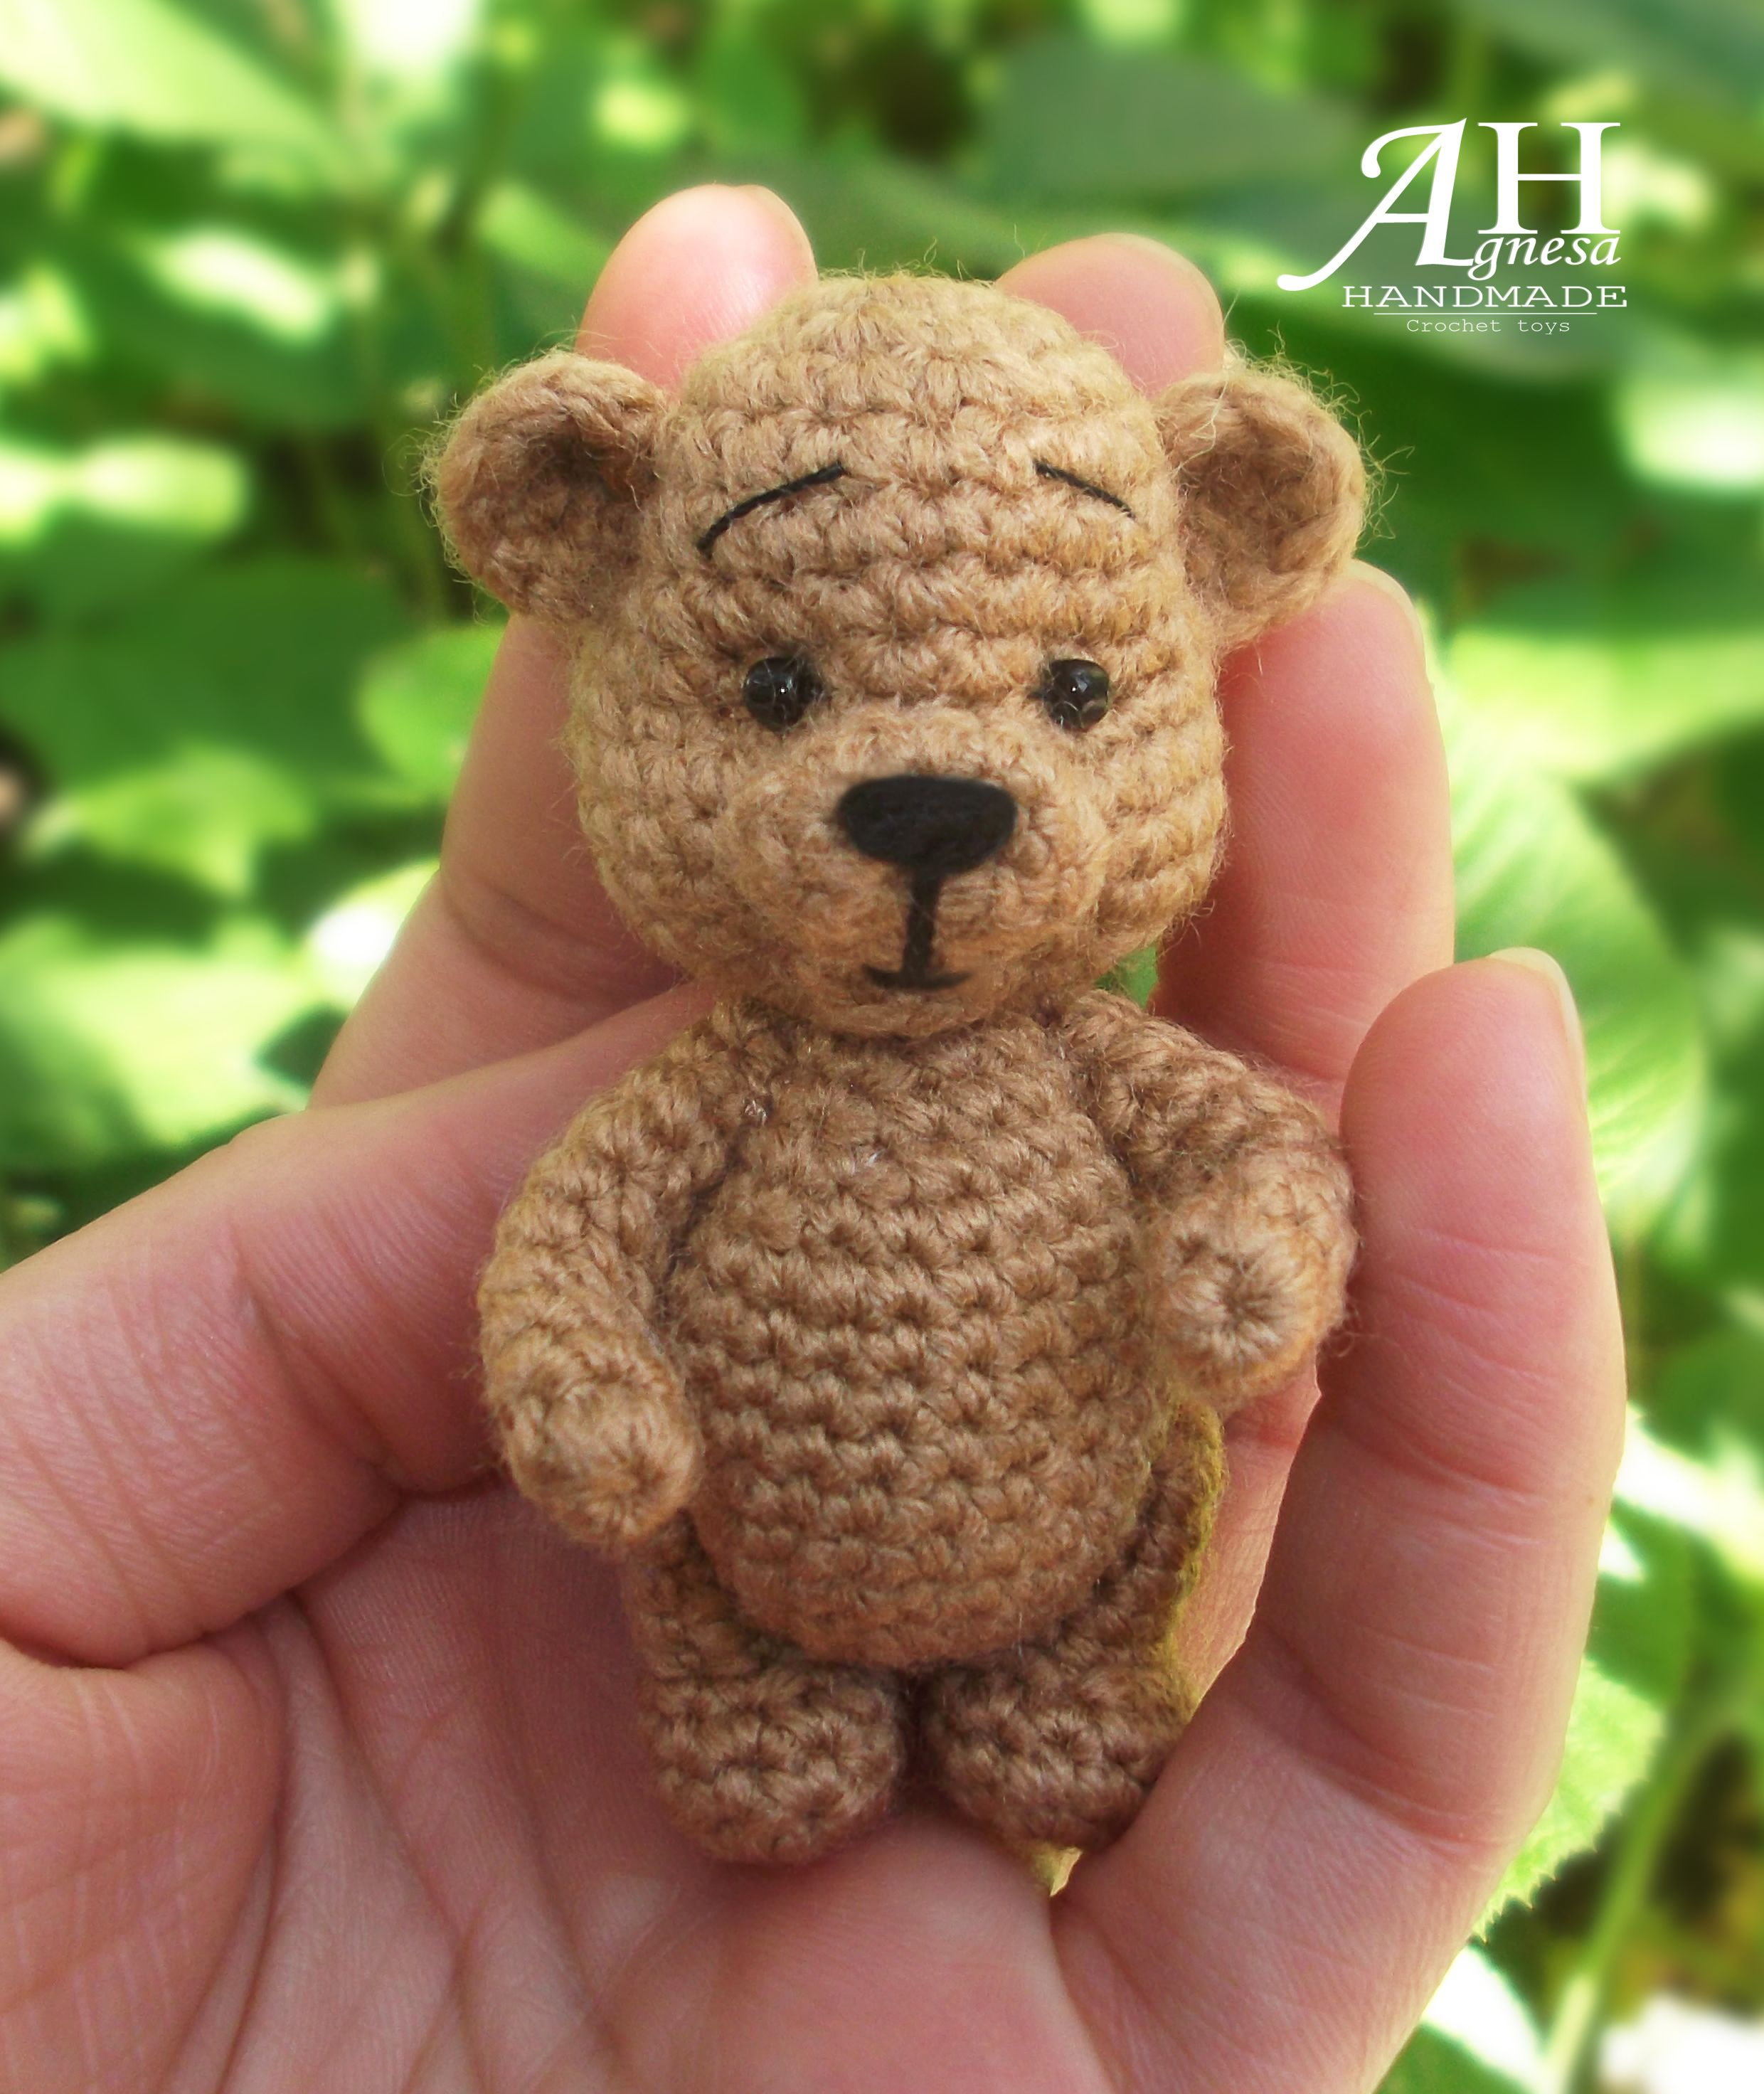 crochet teddy bear | crochet | Pinterest | Patrón gratis, Mono y ...